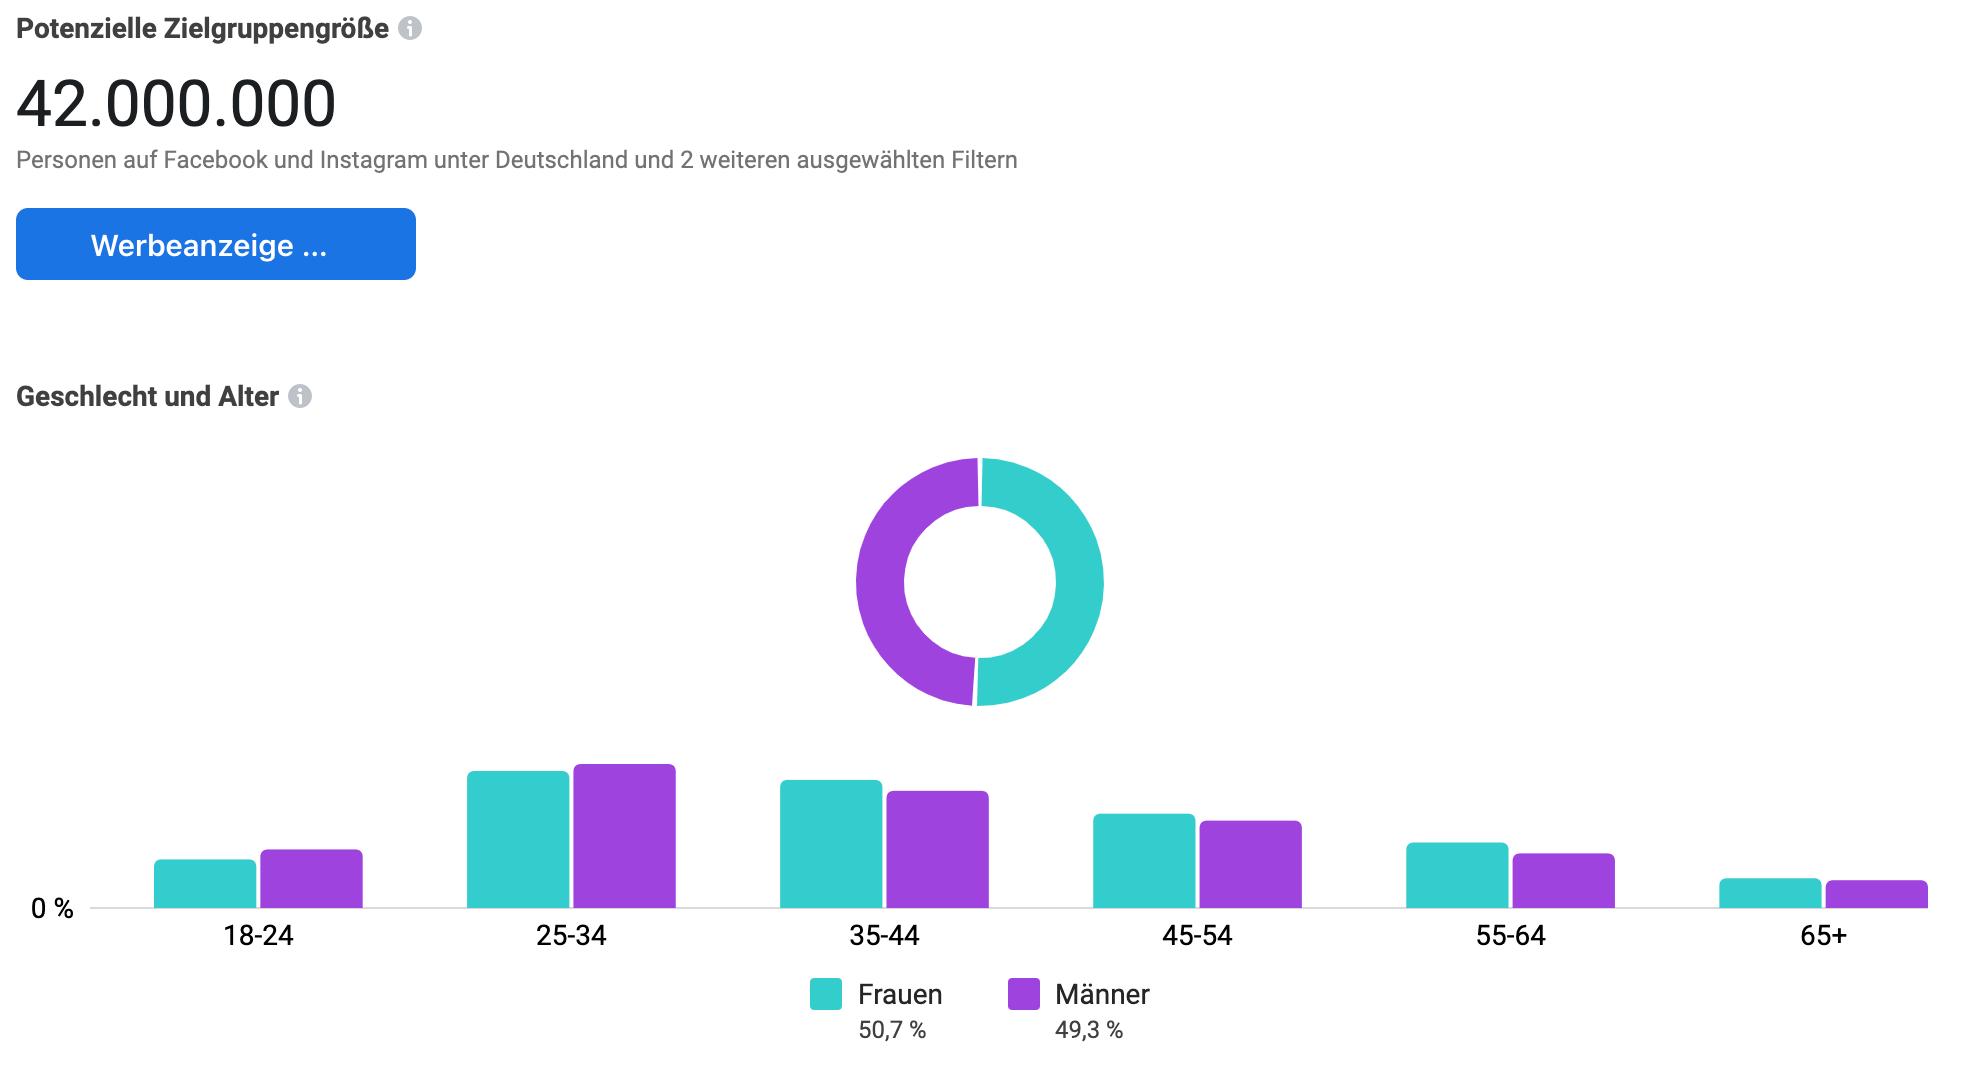 Grafik der potentiellen zielgruppengröße